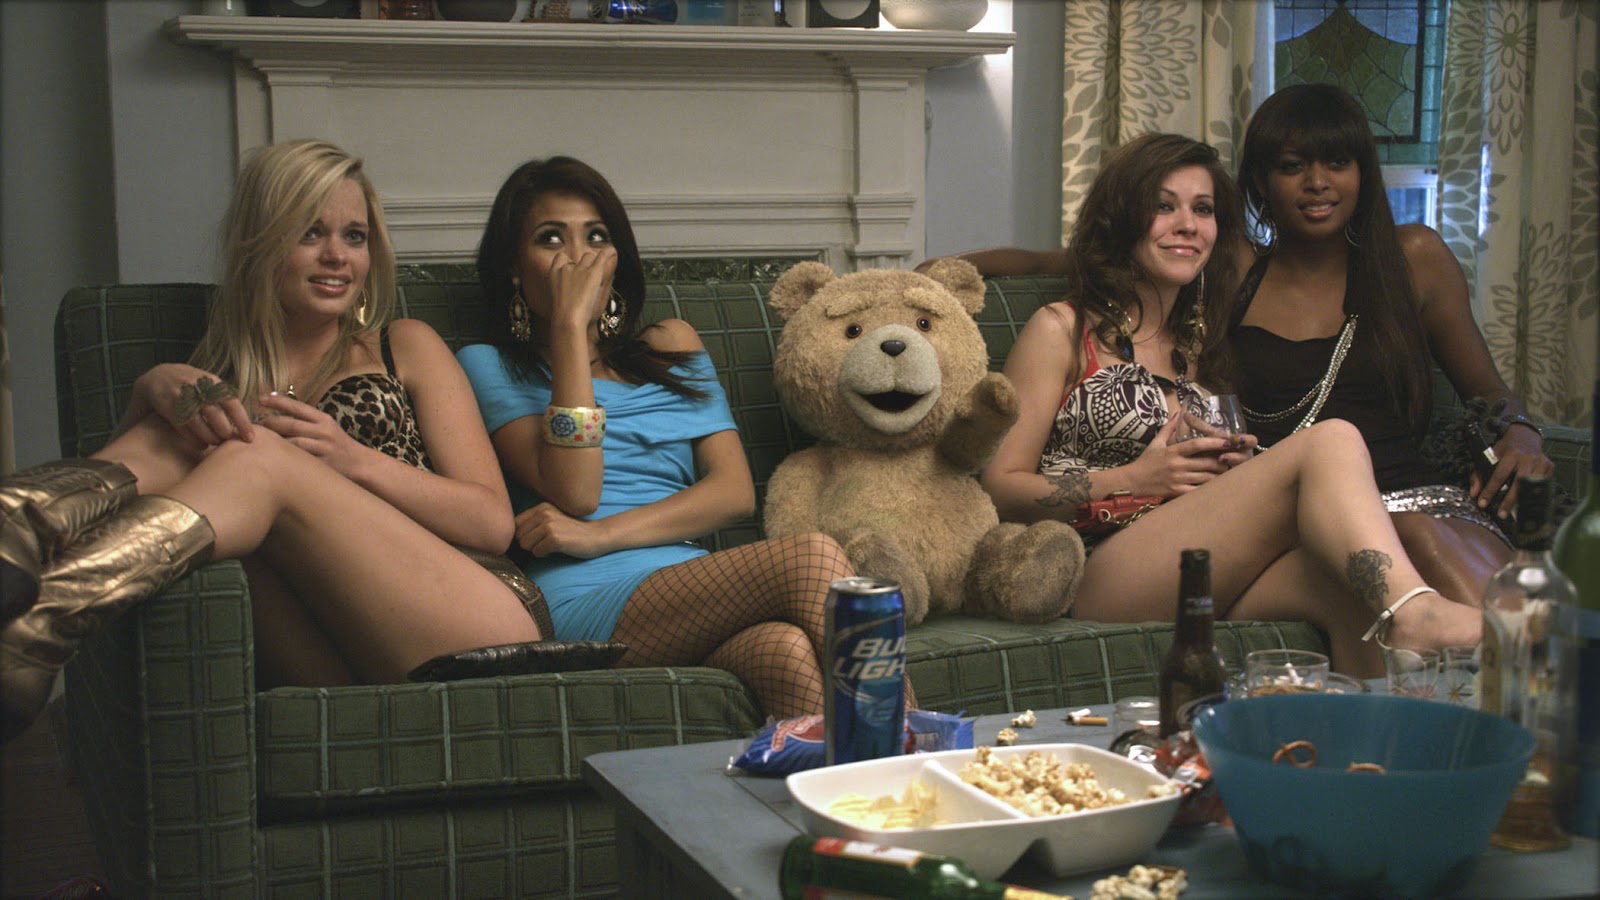 http://4.bp.blogspot.com/-zByXFAHR_BI/T-udM1qFaeI/AAAAAAAACFM/-NXOKkA1MG0/s1600/Mila-Kunis-Ted-movie-image-2.jpg